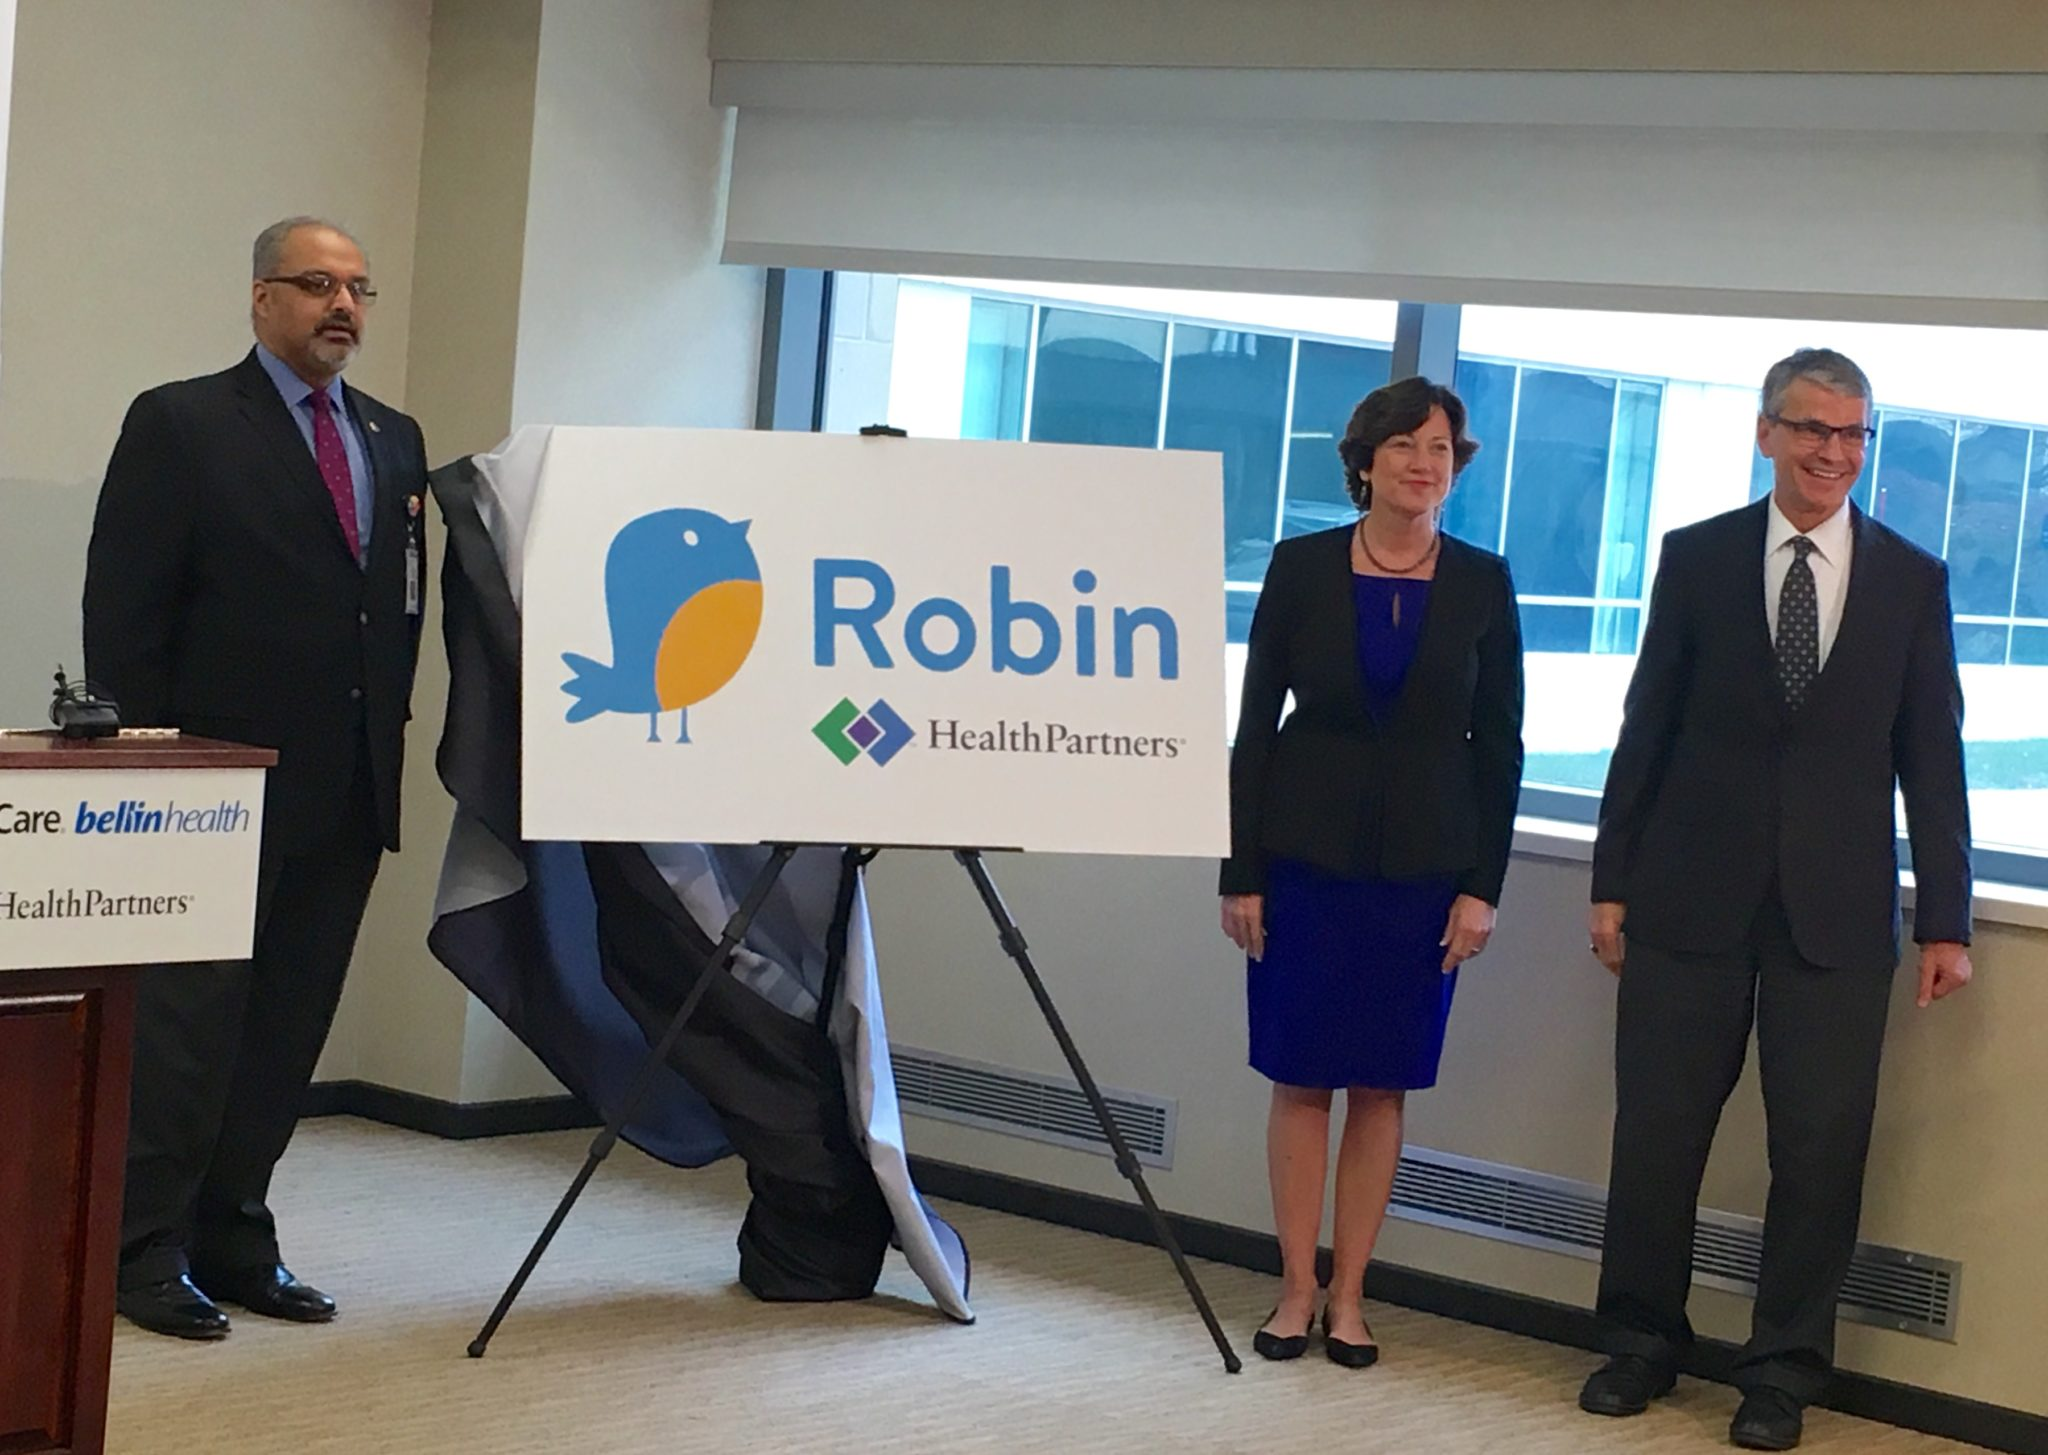 Robin with HealthPartners - Wisconsin Health News